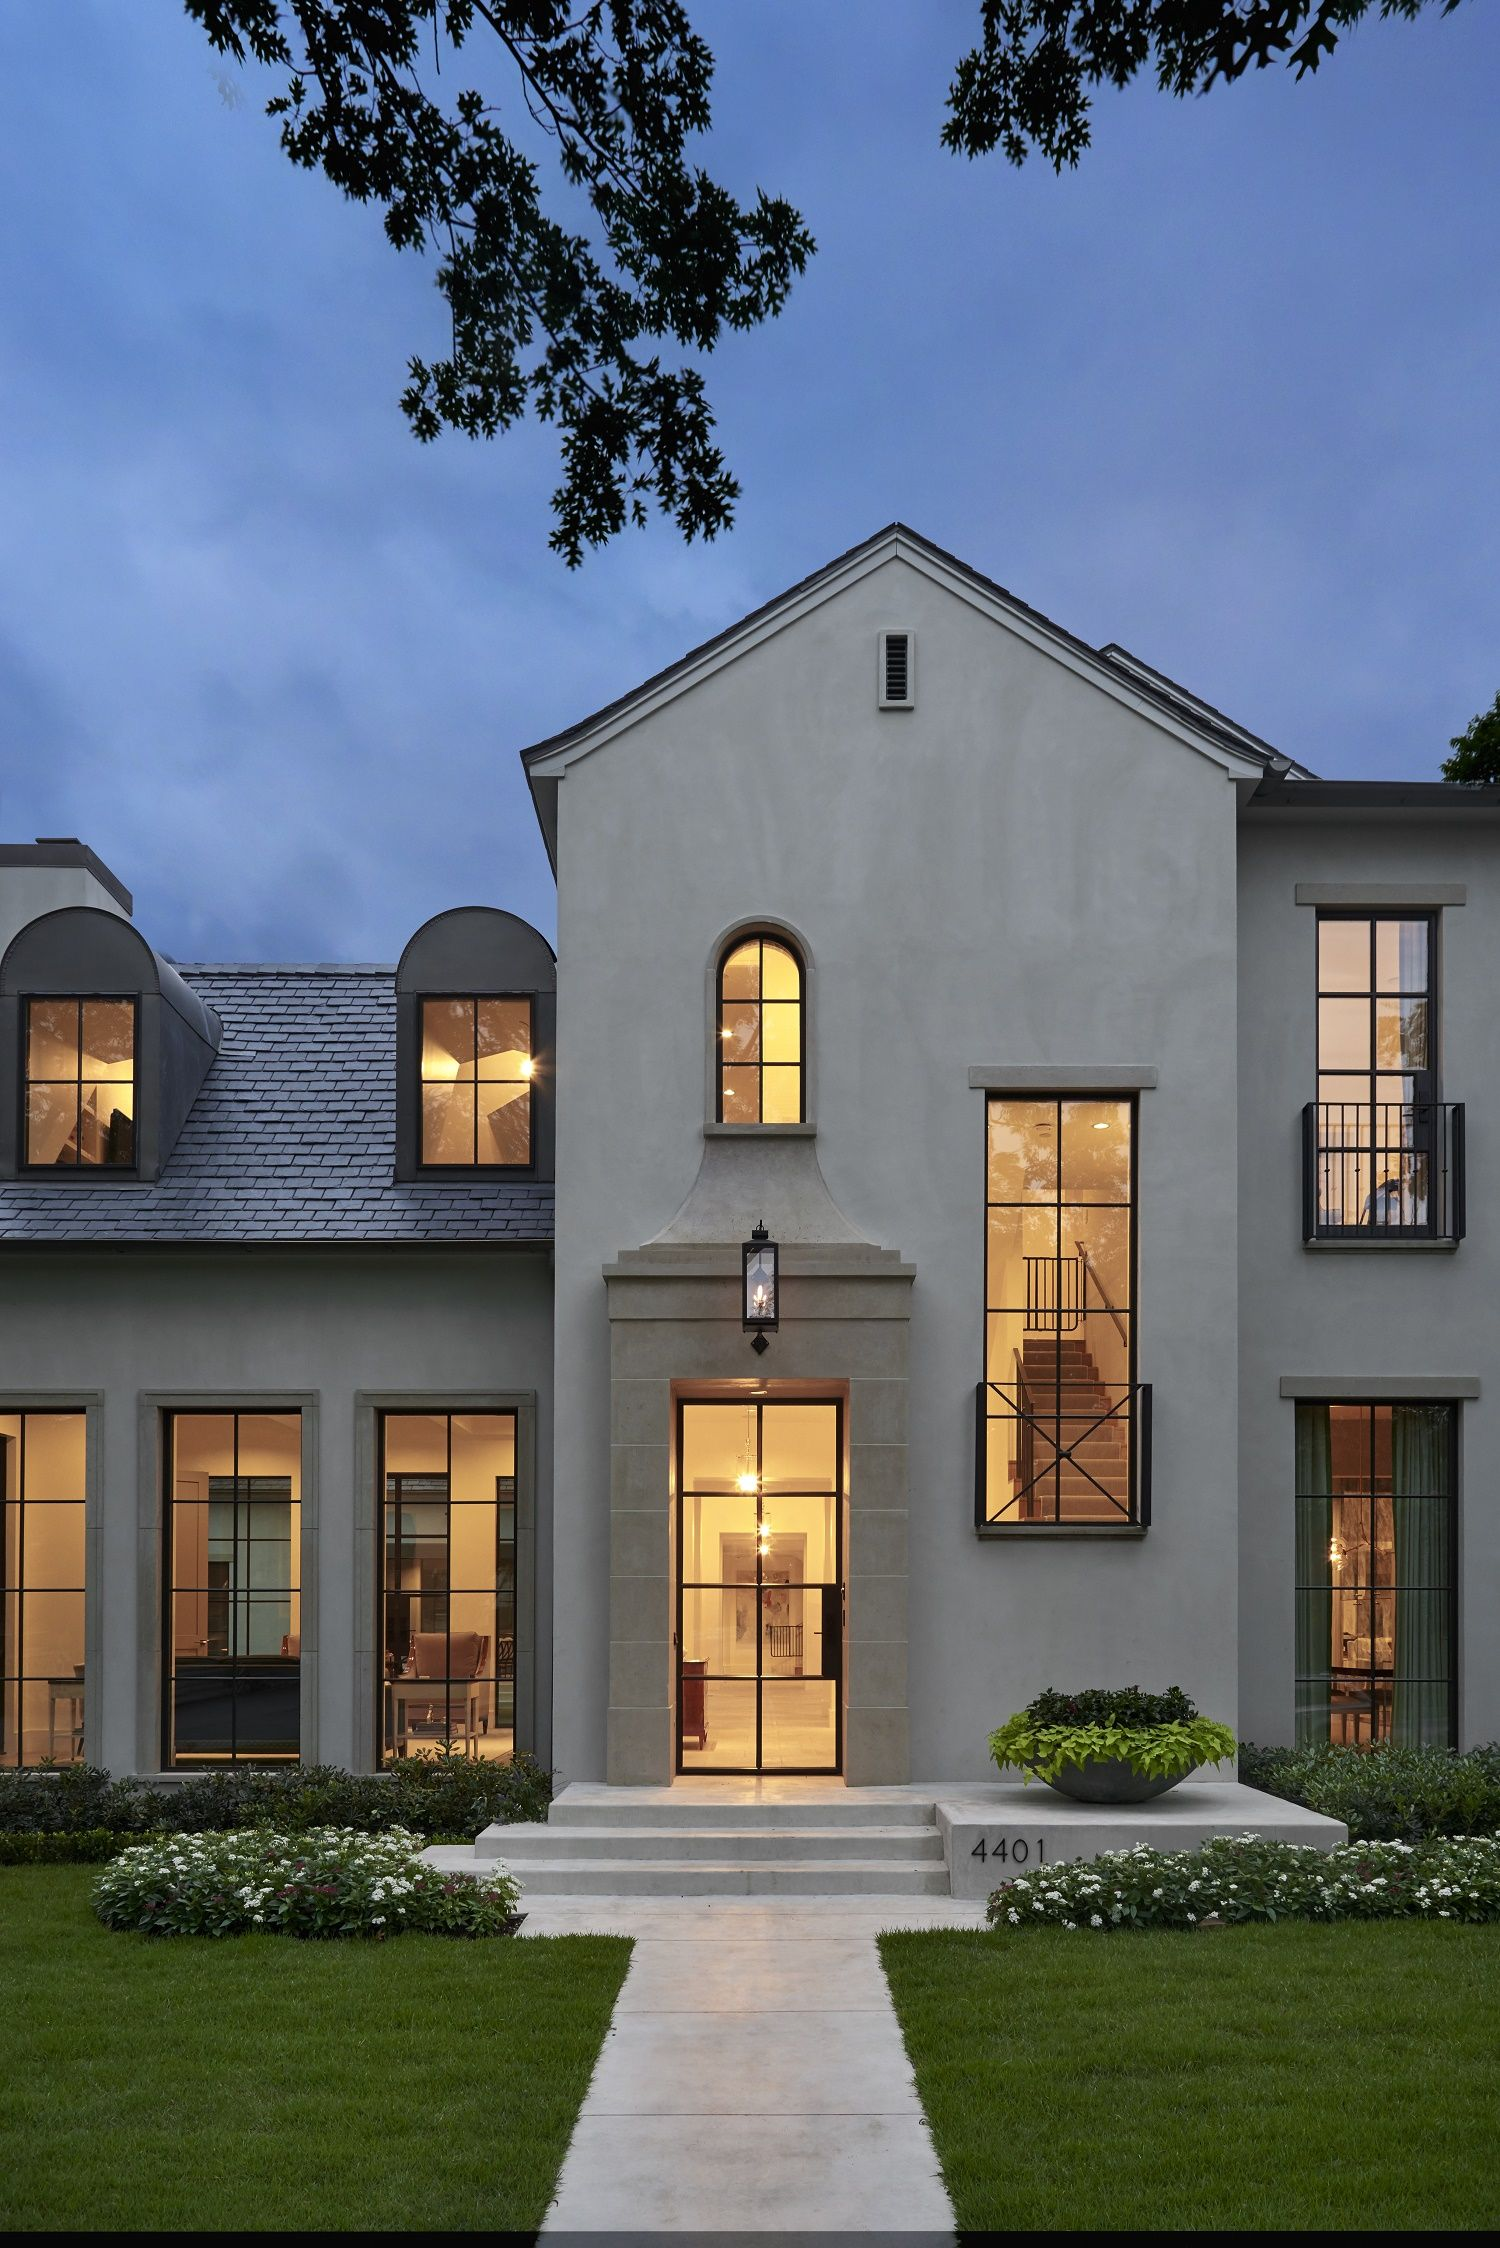 4401 San Carlos Coats Homes